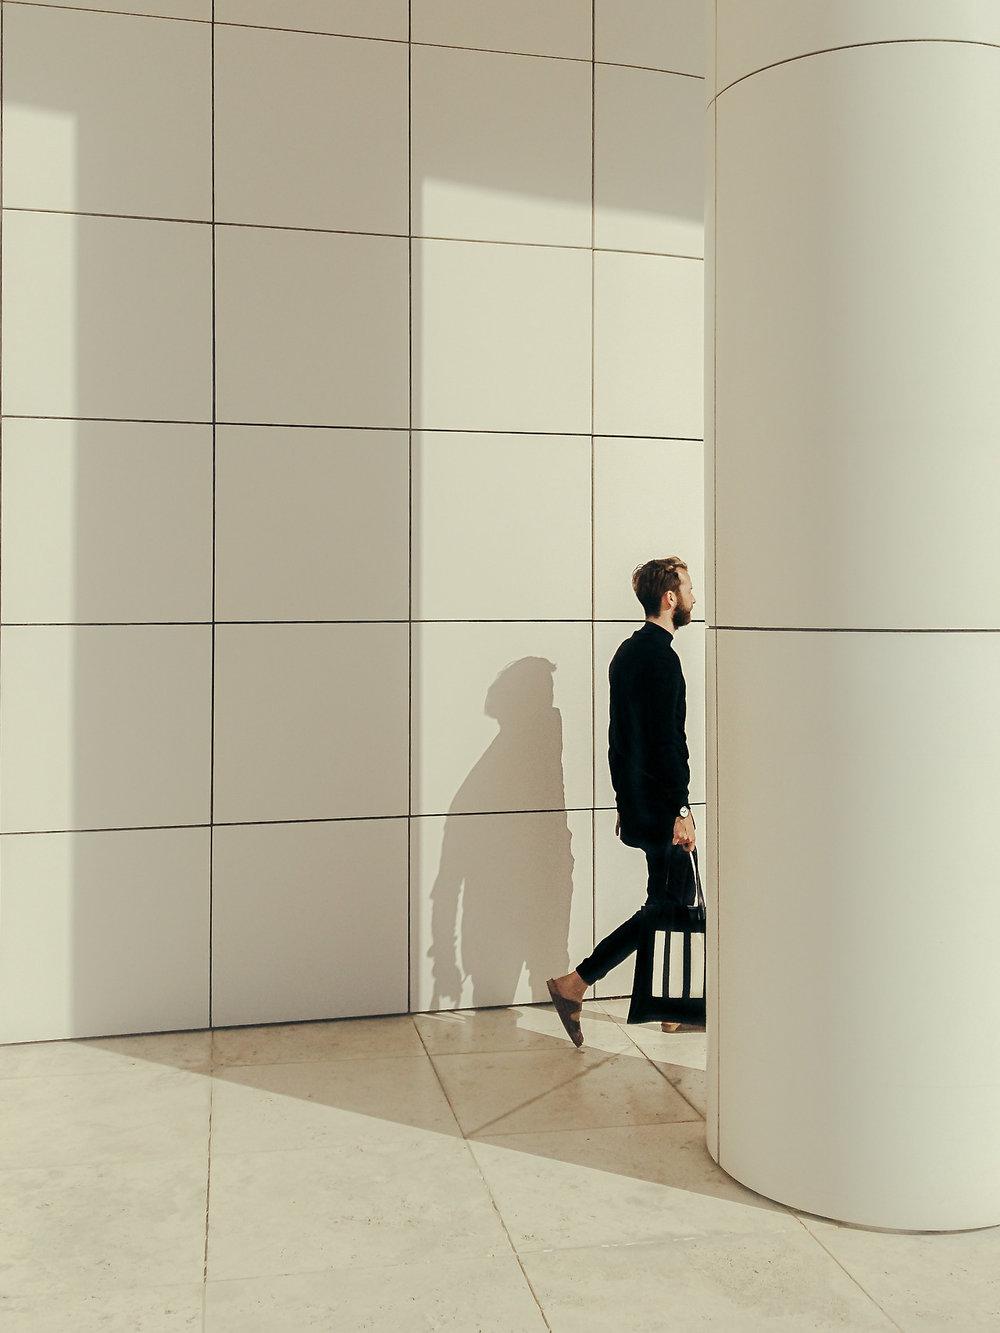 Architectural Silhouettes  @motifno3